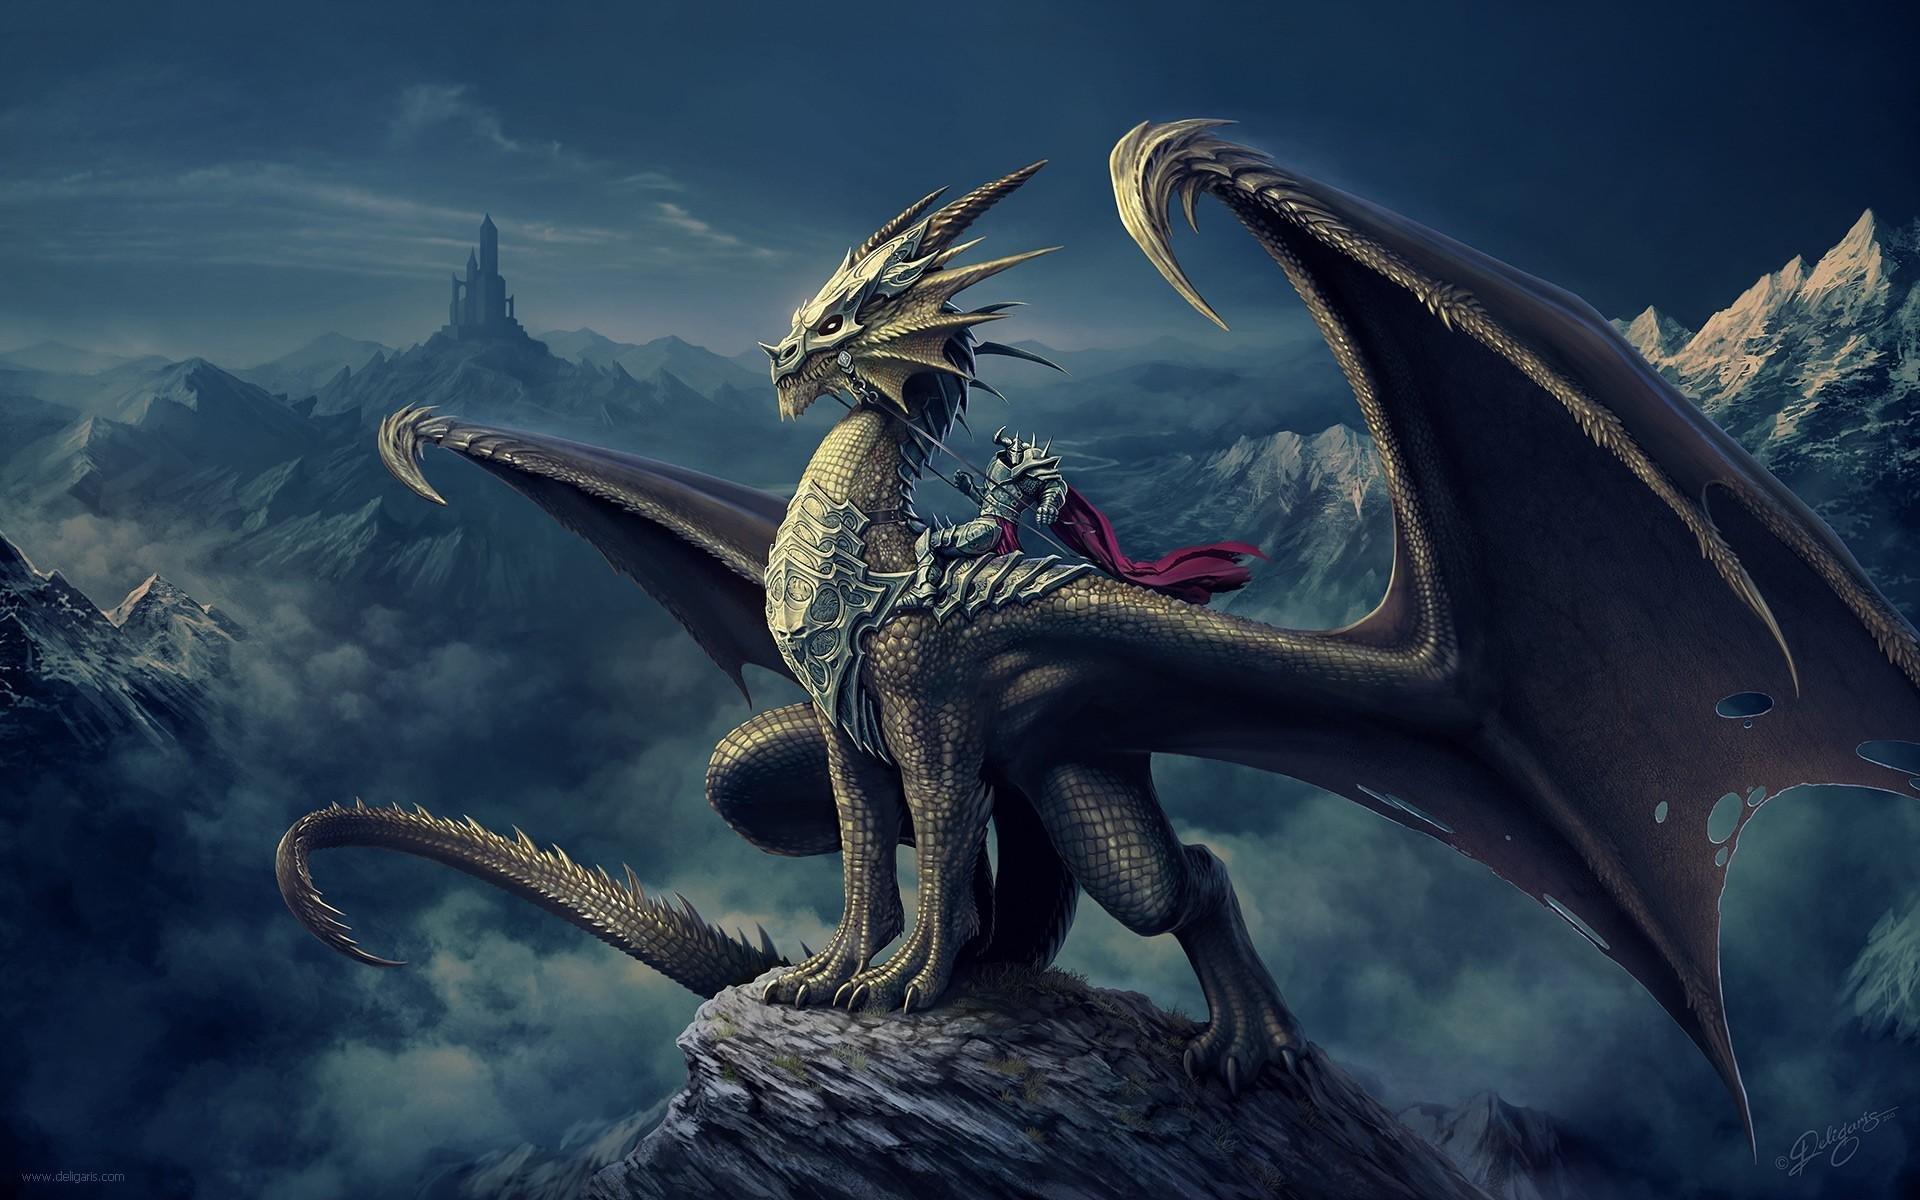 Armored Dragon Wallpaper Dragon Artwork Mordekaiser